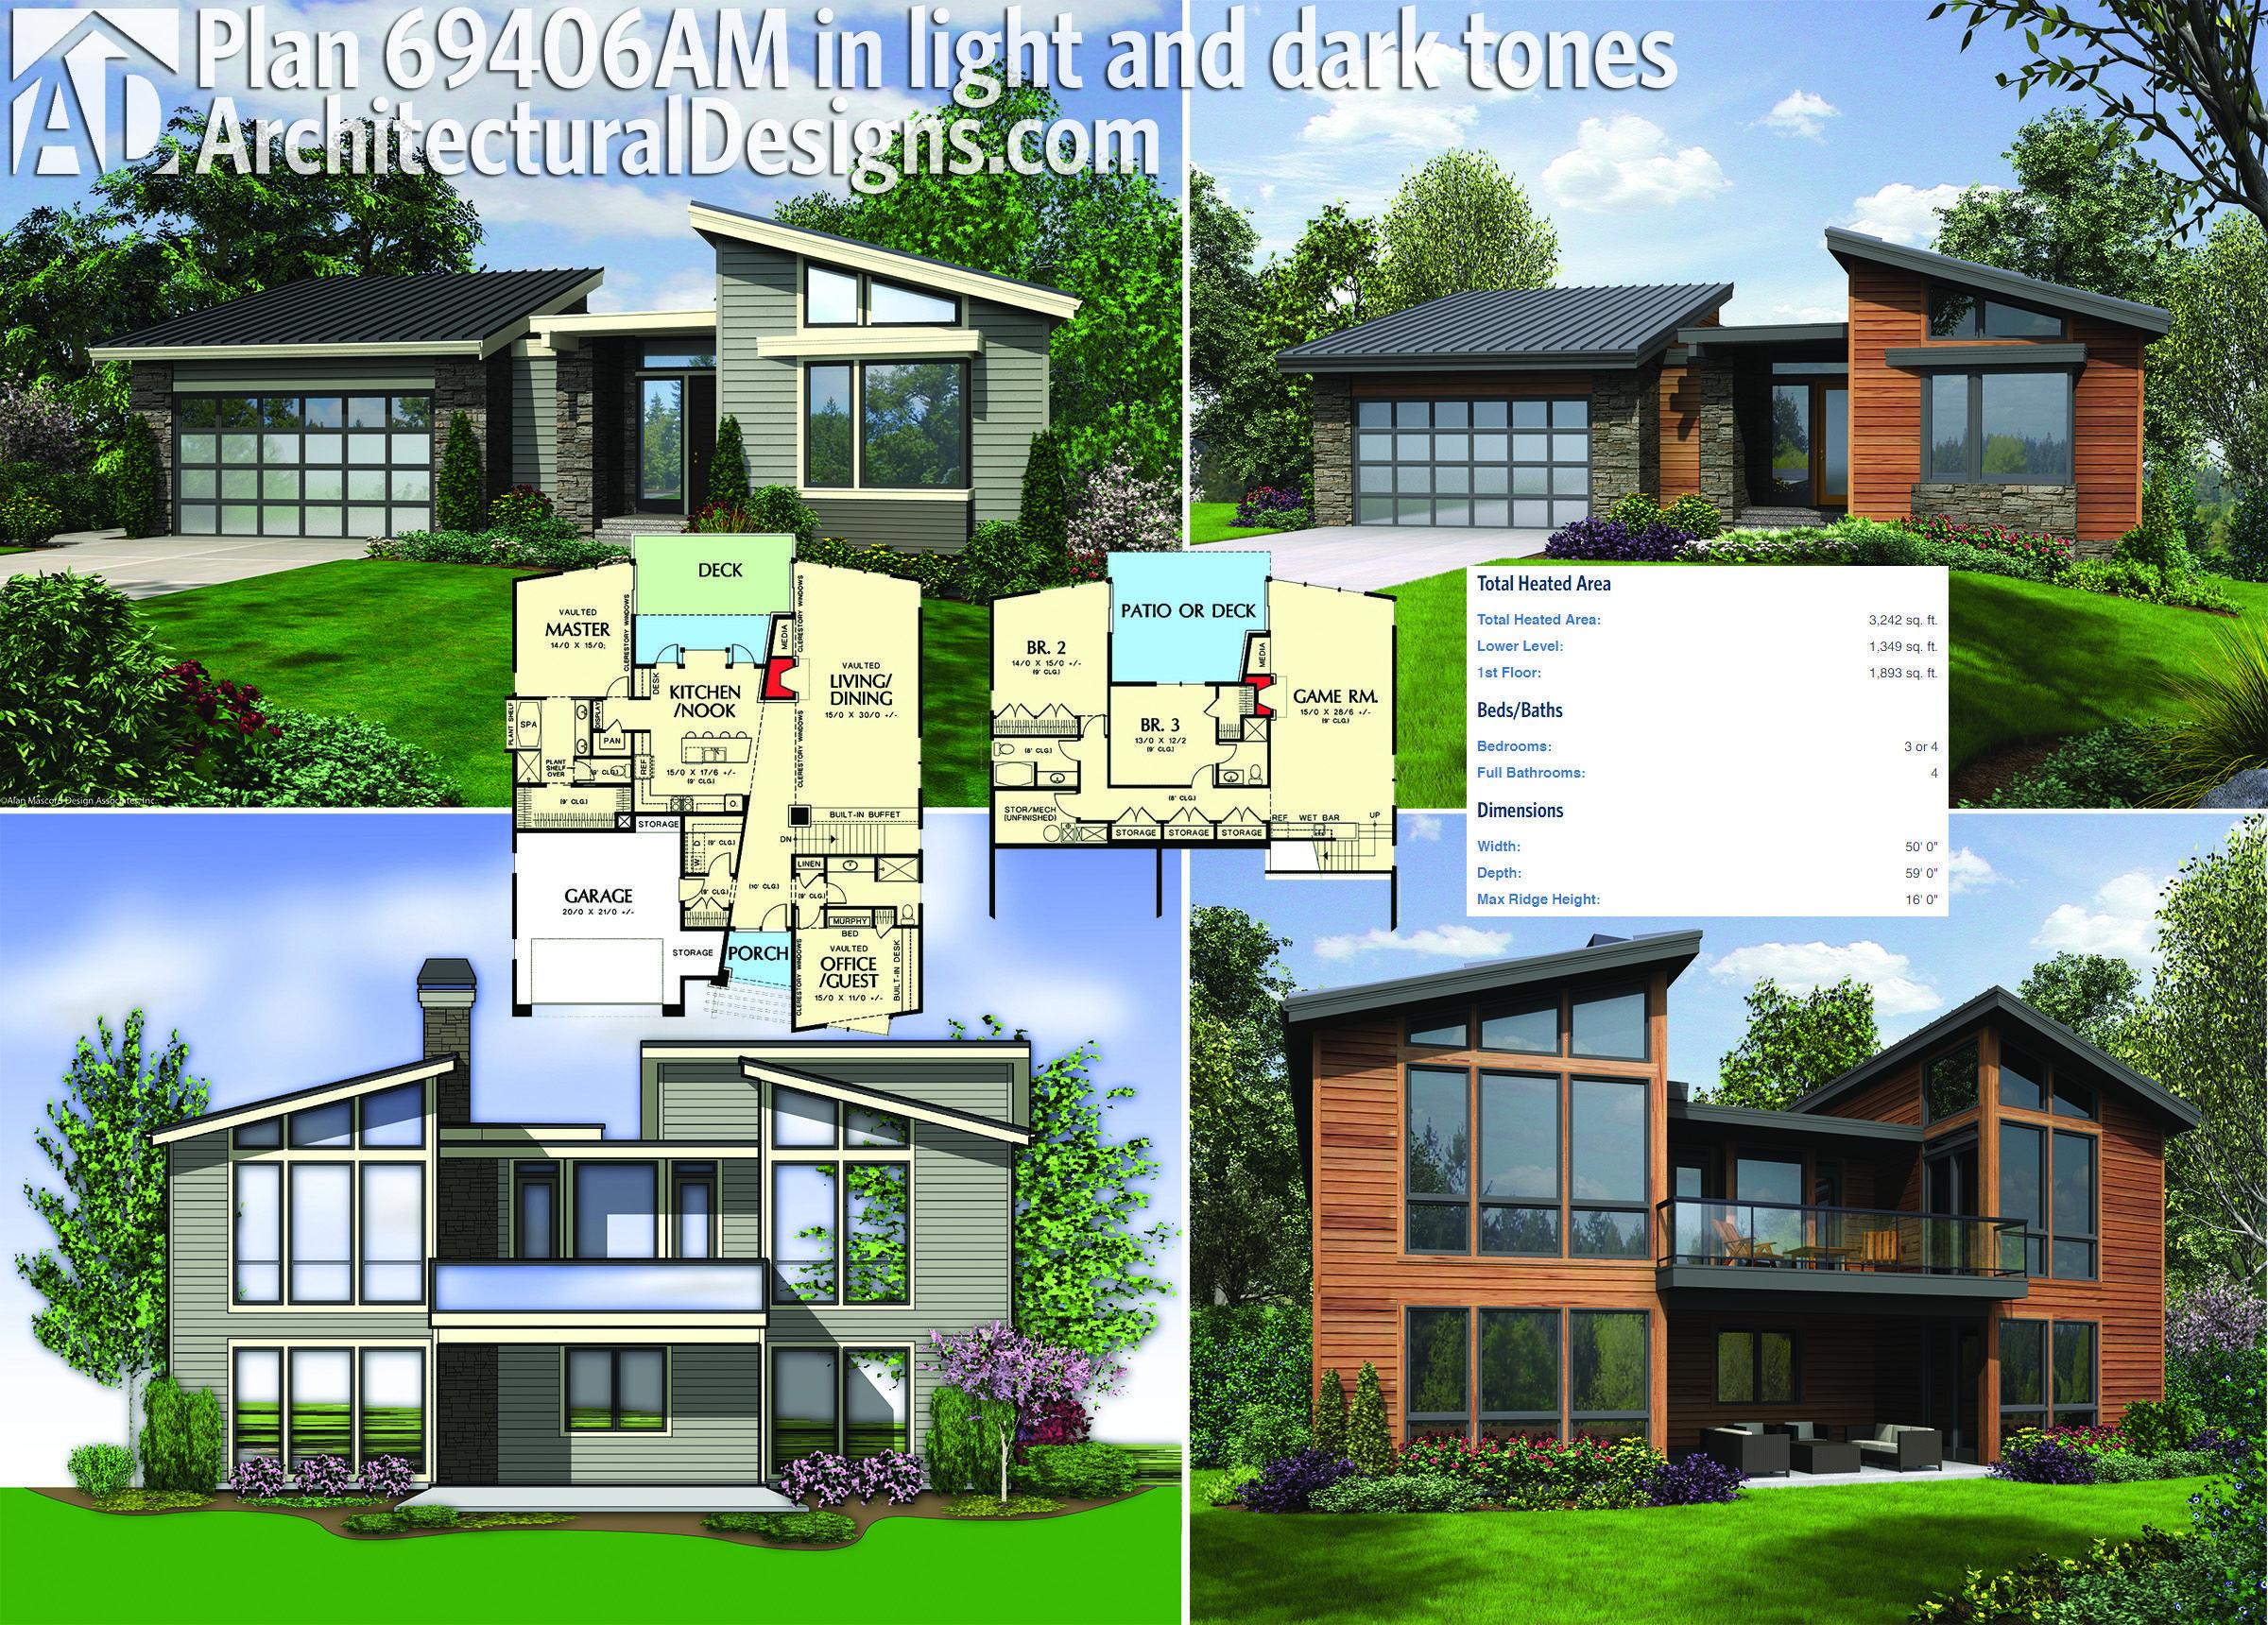 Architectural Designs Modern House Plan 69406AM is